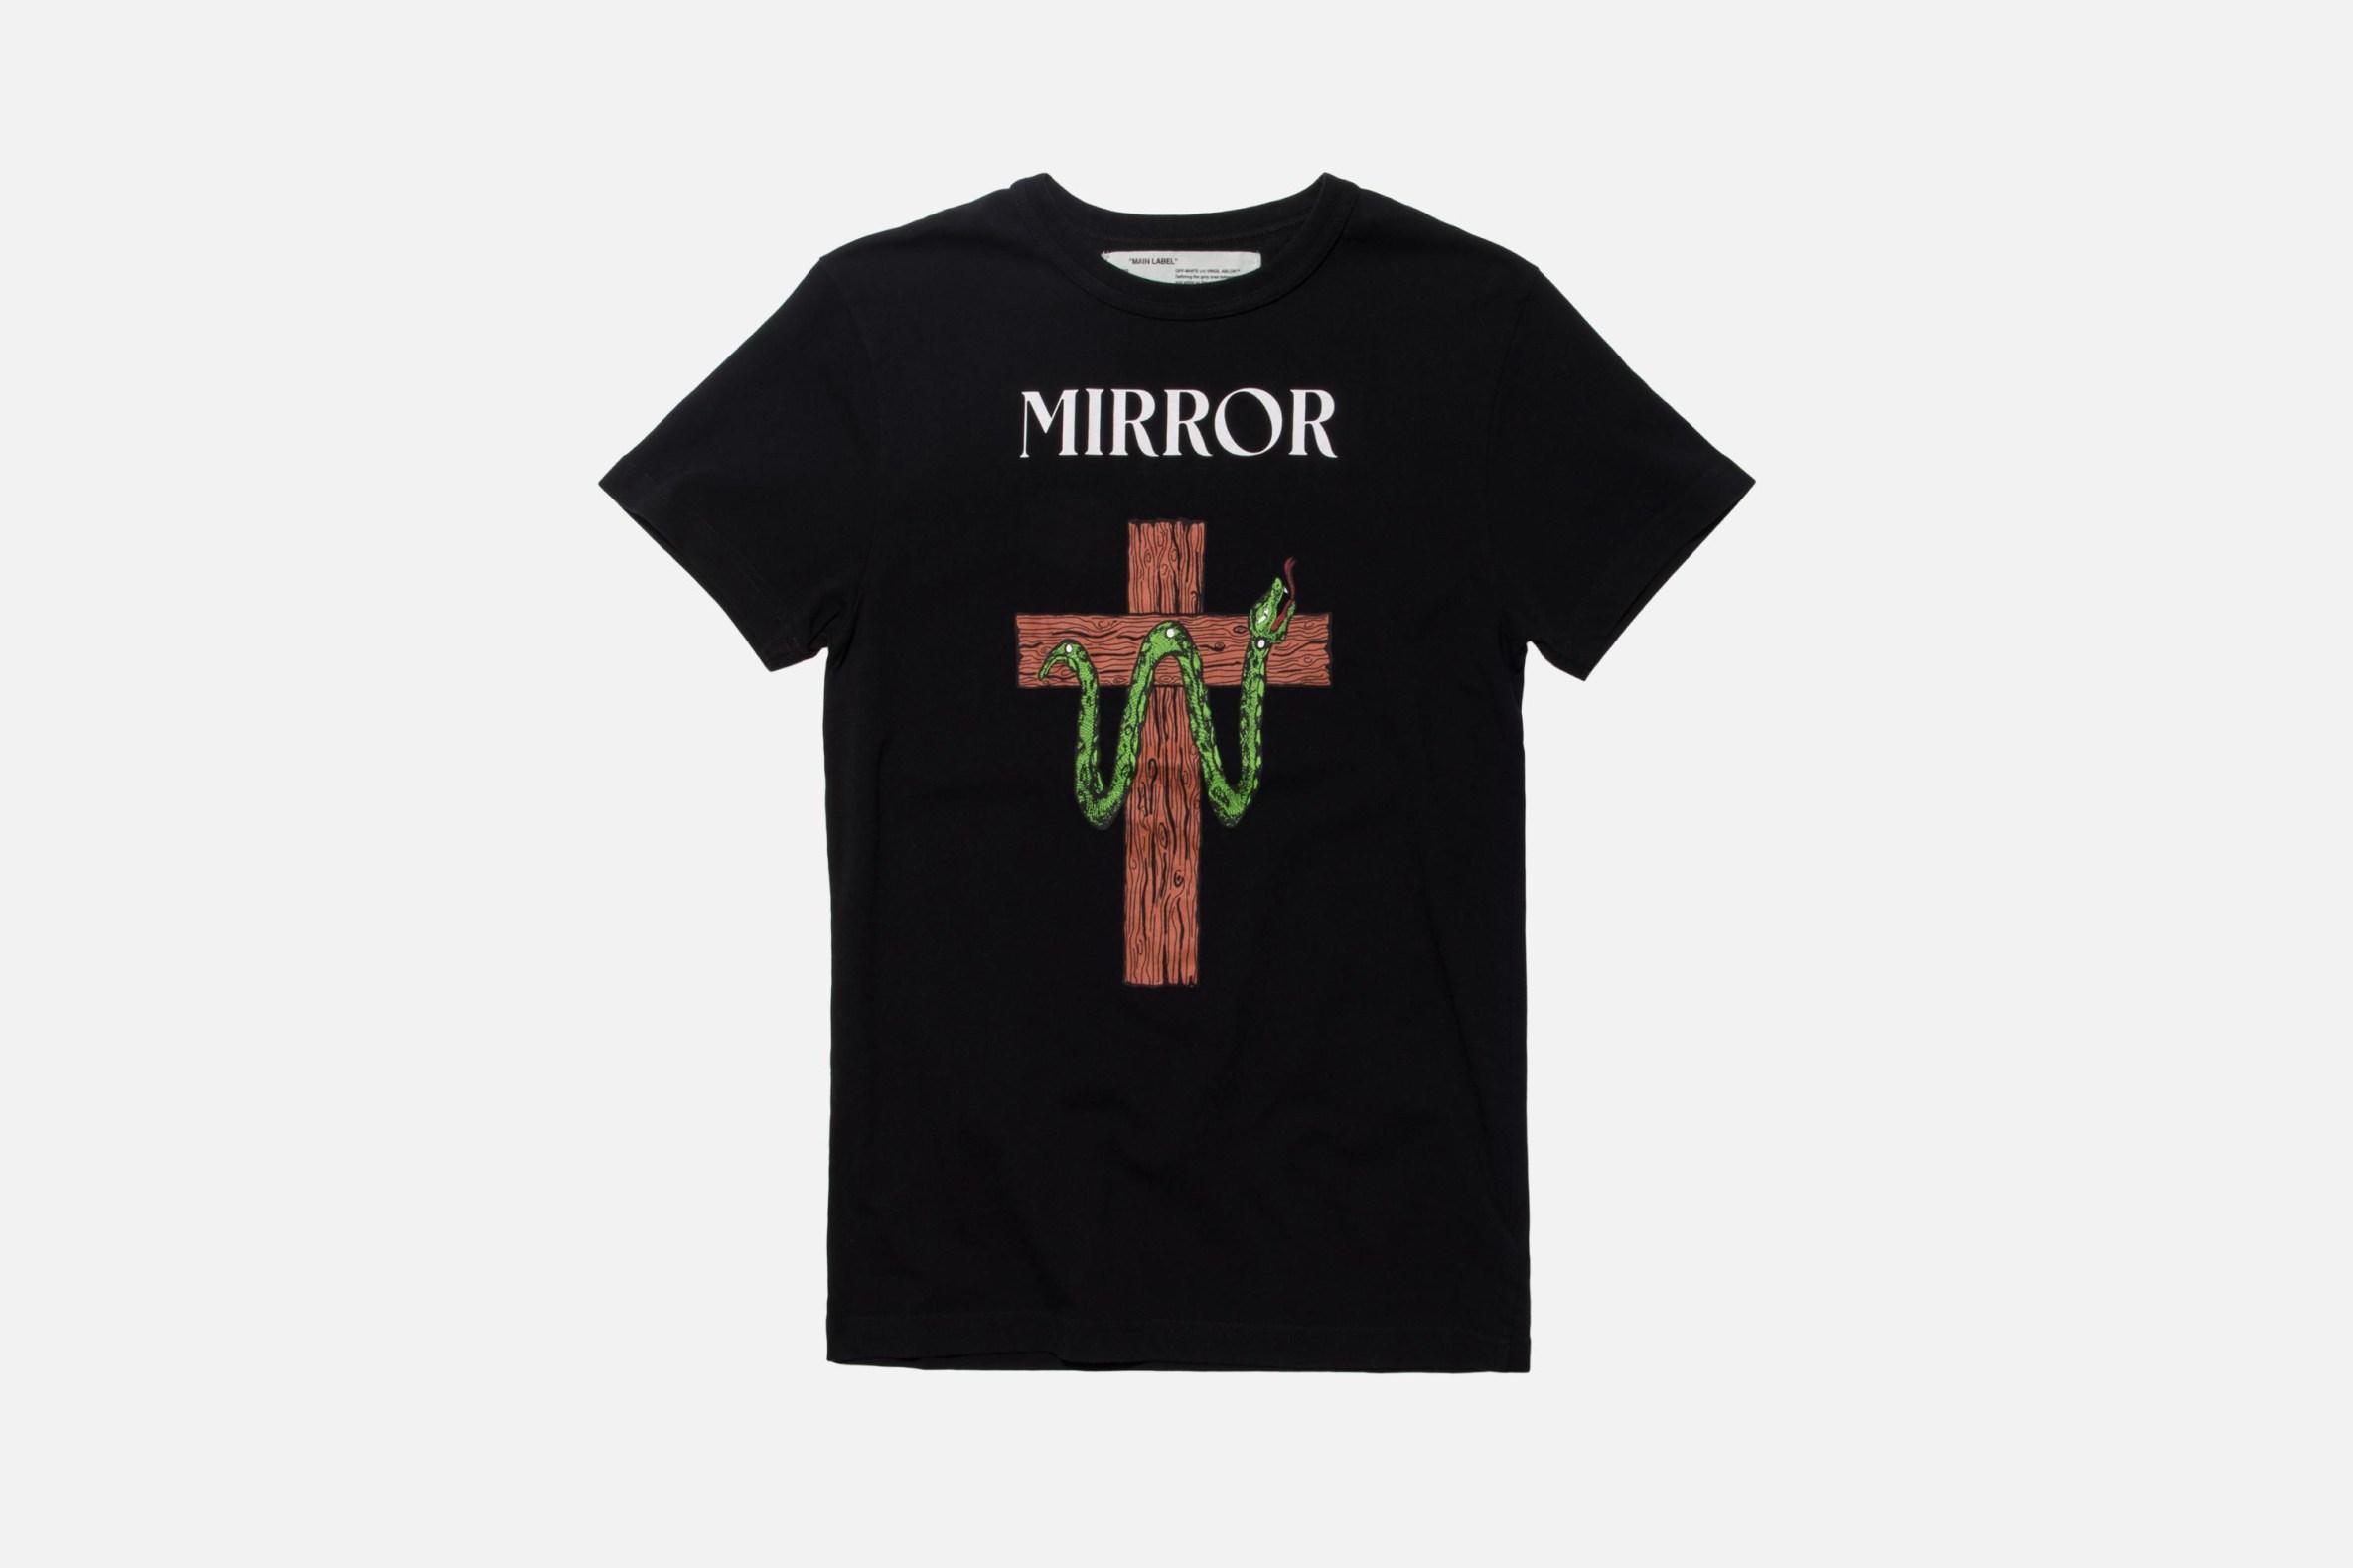 off-white-mirror-mirror-t-shirts-buy-now-4